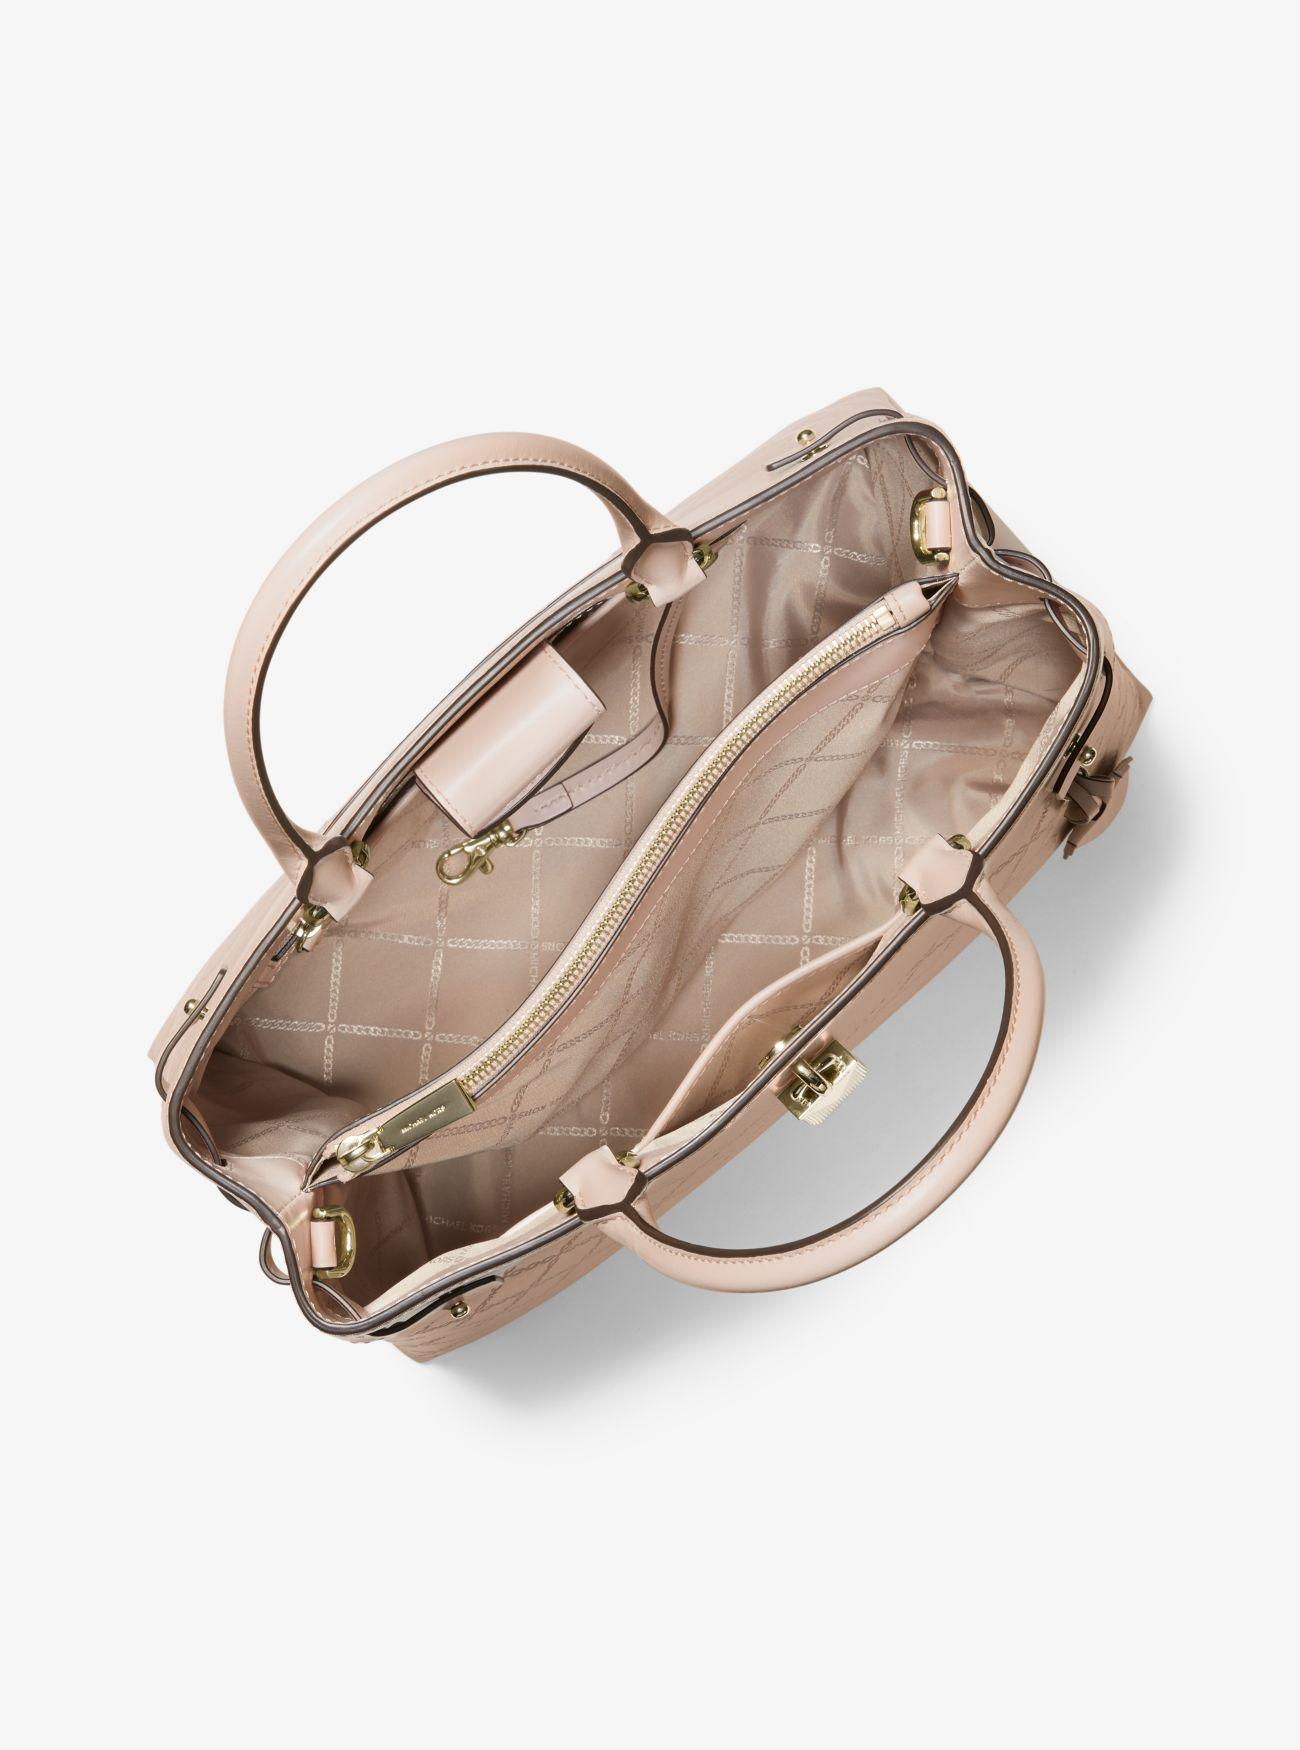 83753b7d9035 Michael Kors - Pink Gramercy Large Chain-embossed Leather Satchel - Lyst.  View fullscreen